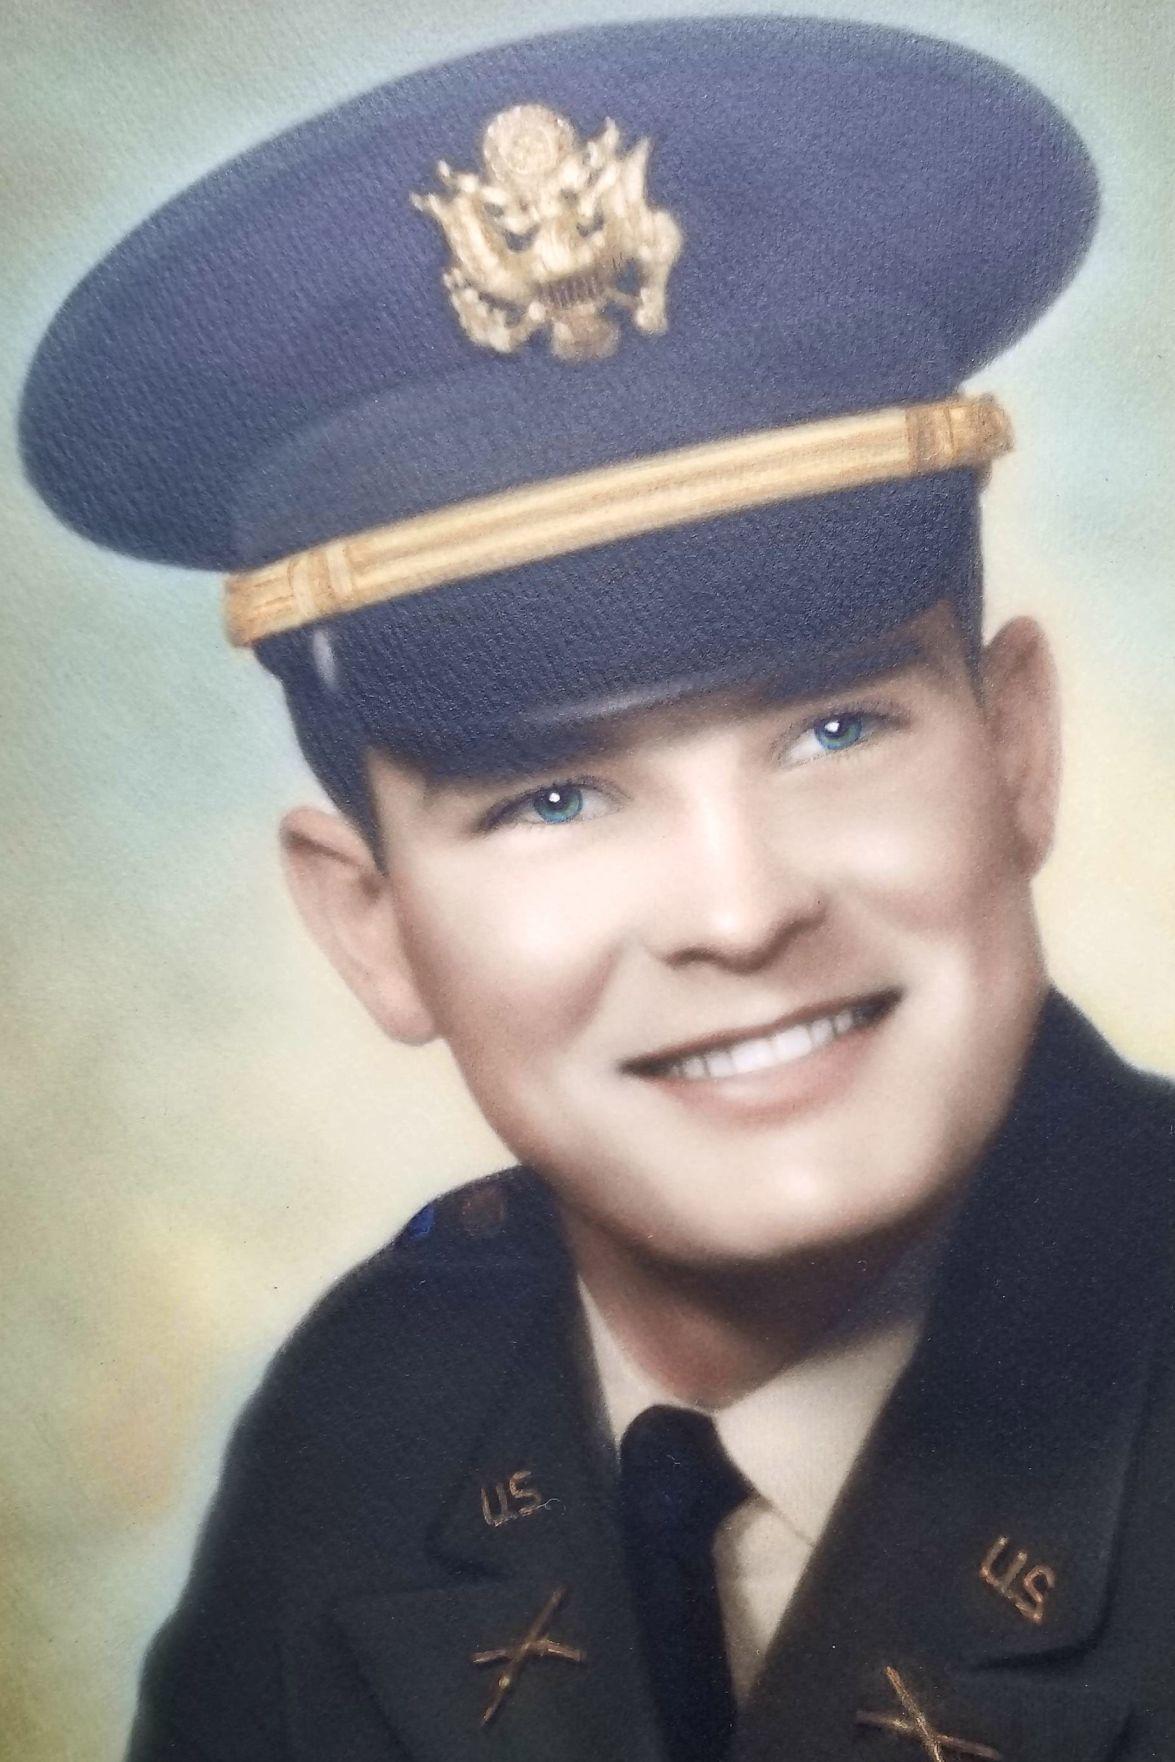 Lt. Colonel N. Michael Sarff